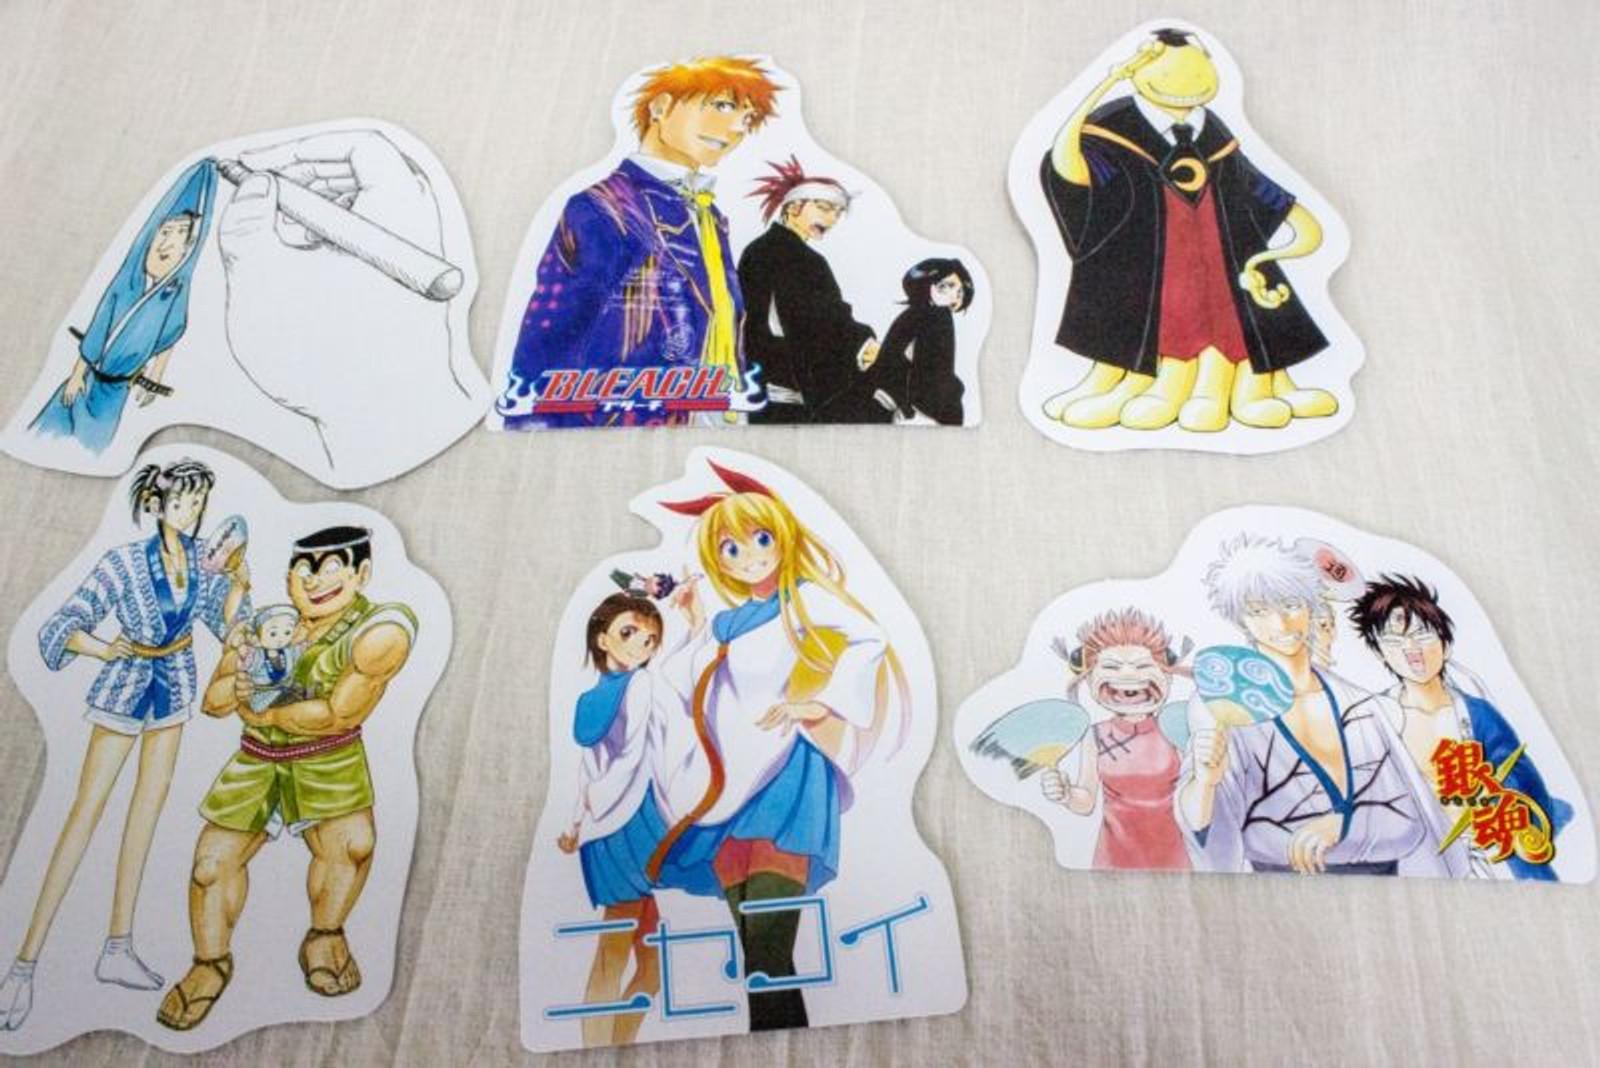 Set of 6 Shonen Jump Message Card / Nisekoi Gintama Bleach JAPAN ANIME MANGA